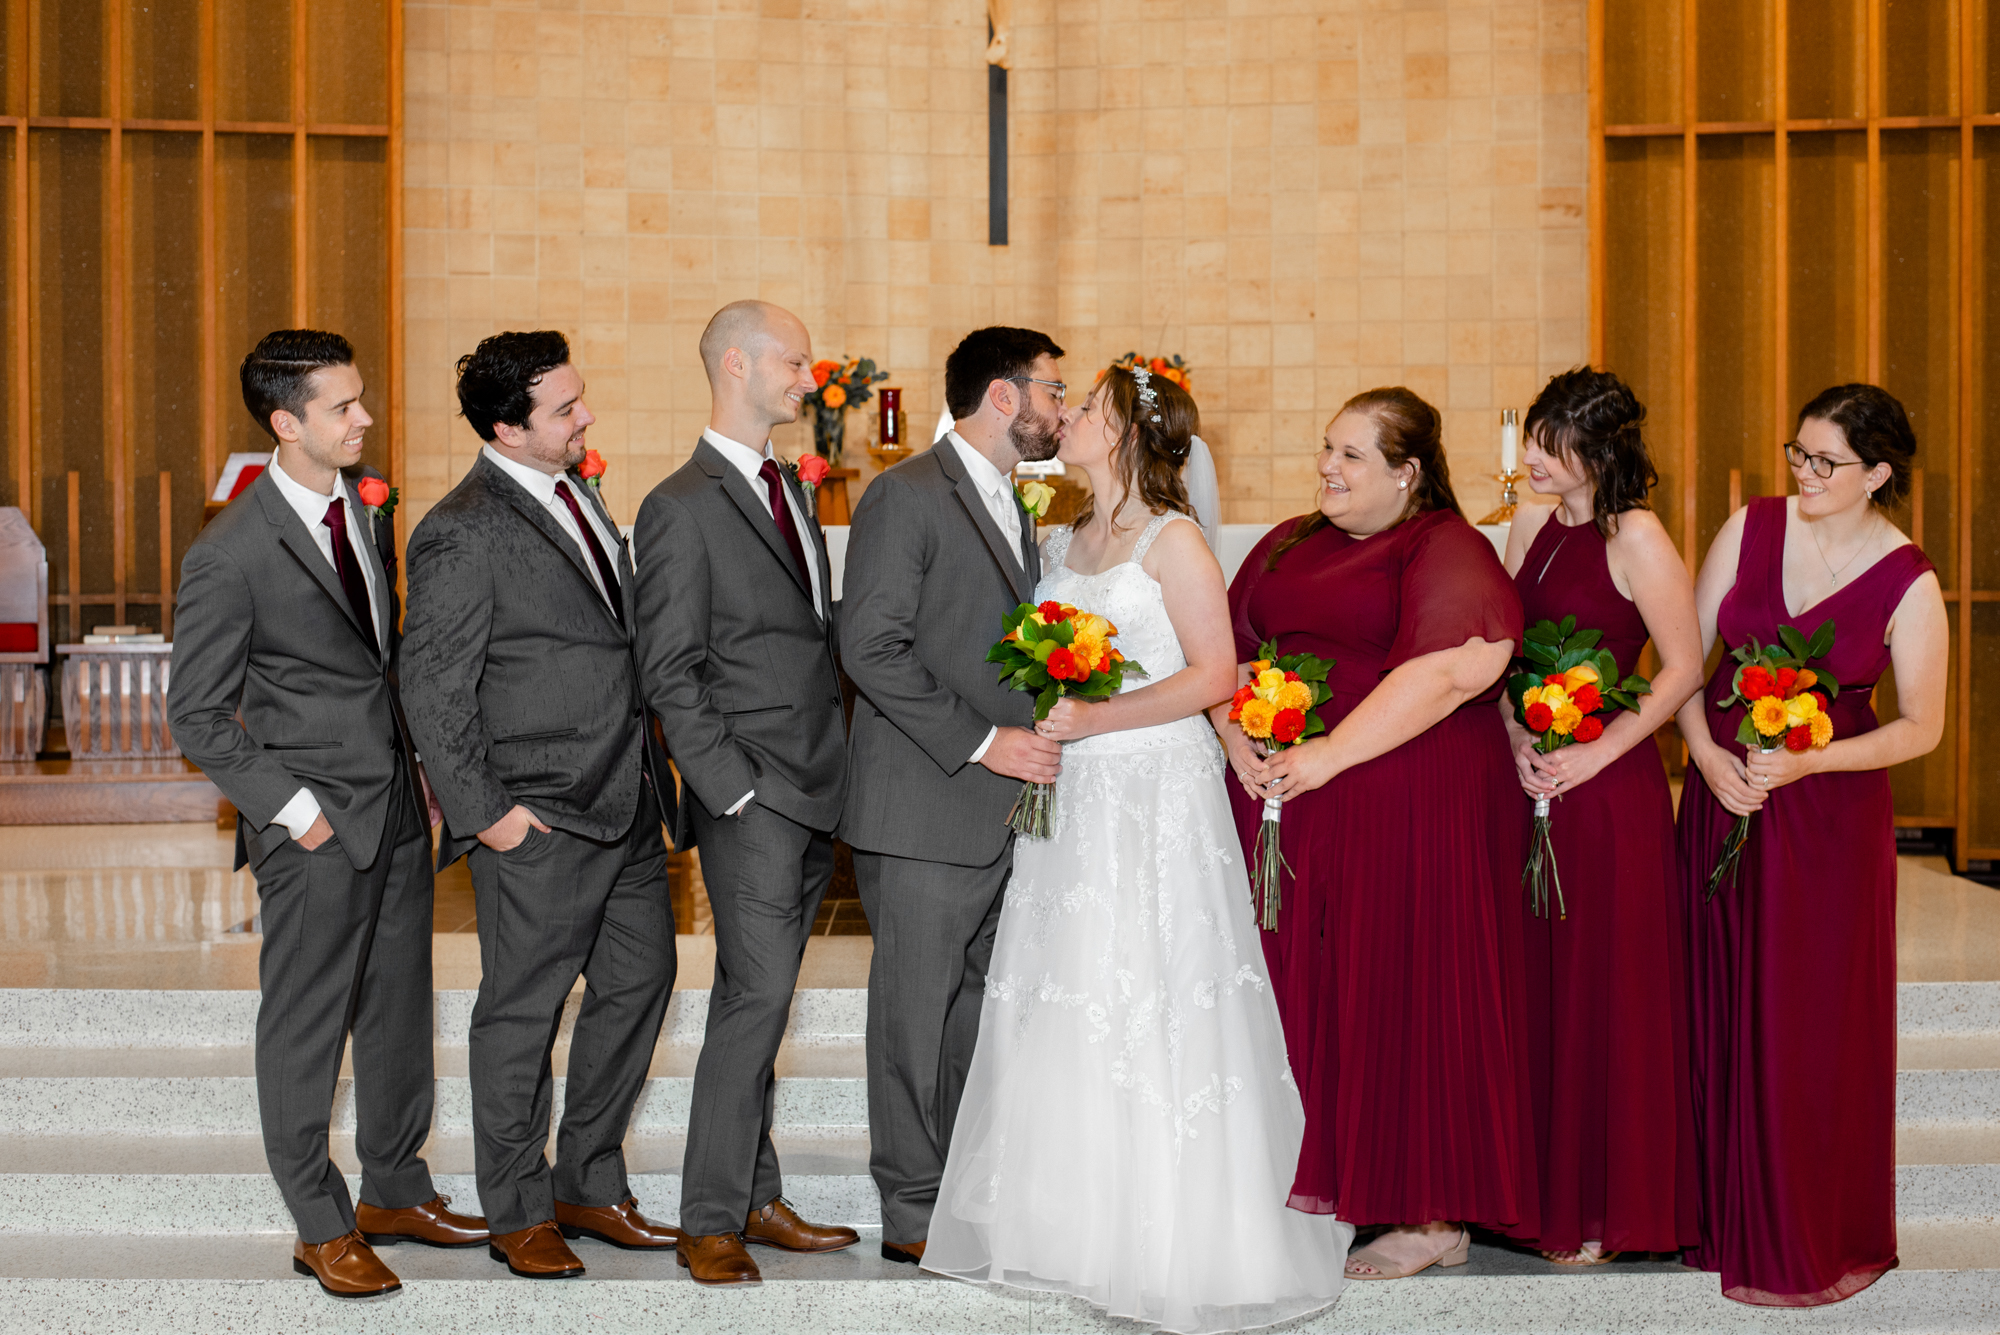 DSC 7602 - Emma and Chris | Fargo Wedding